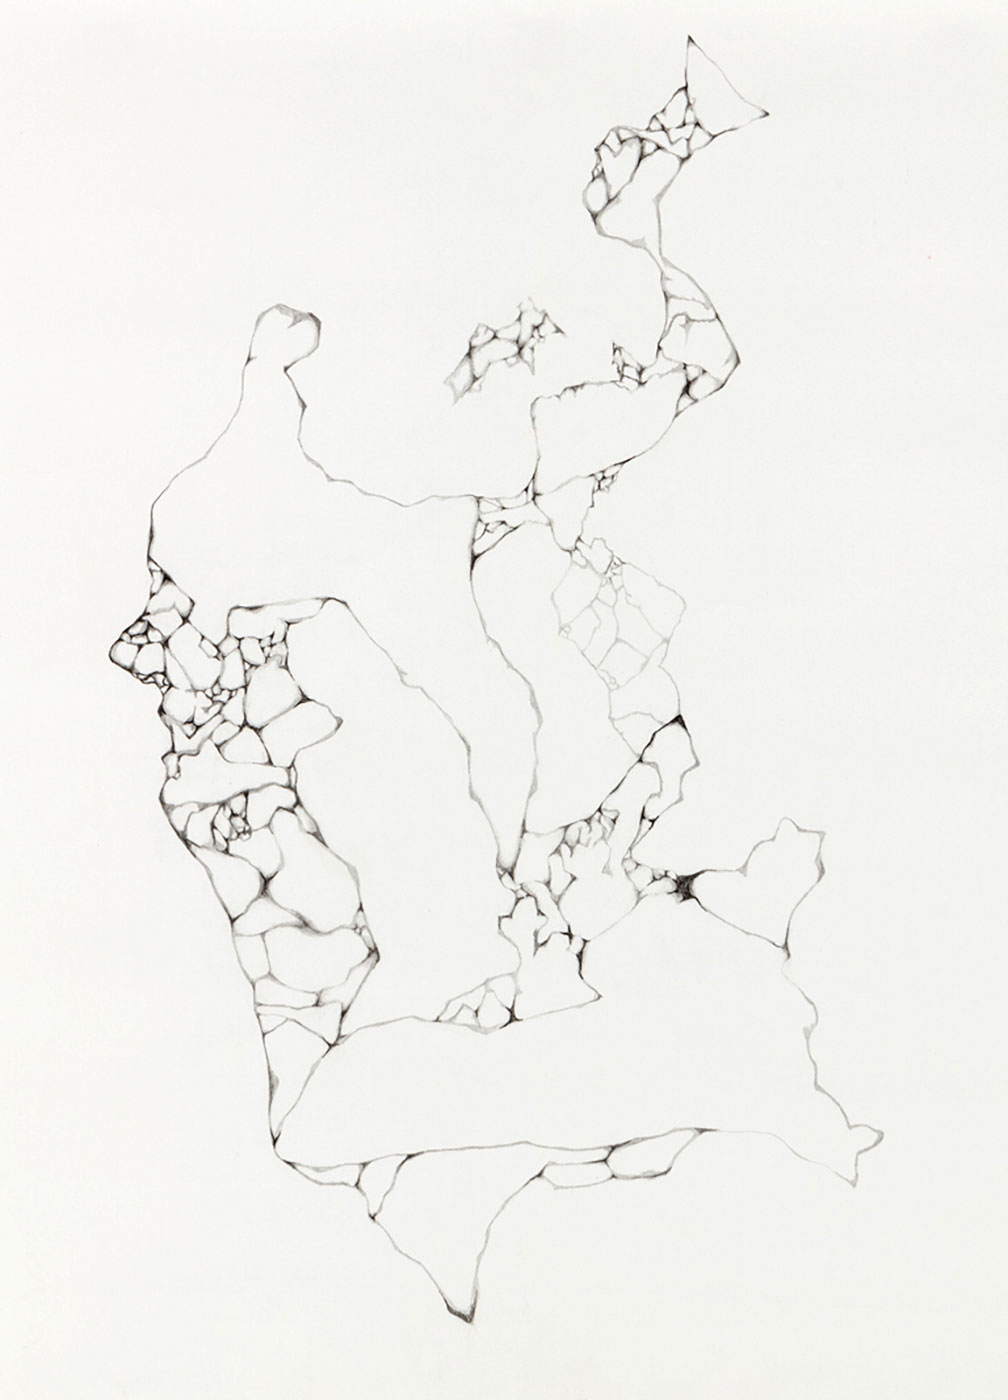 Angie Reisch - Cartography Memoria